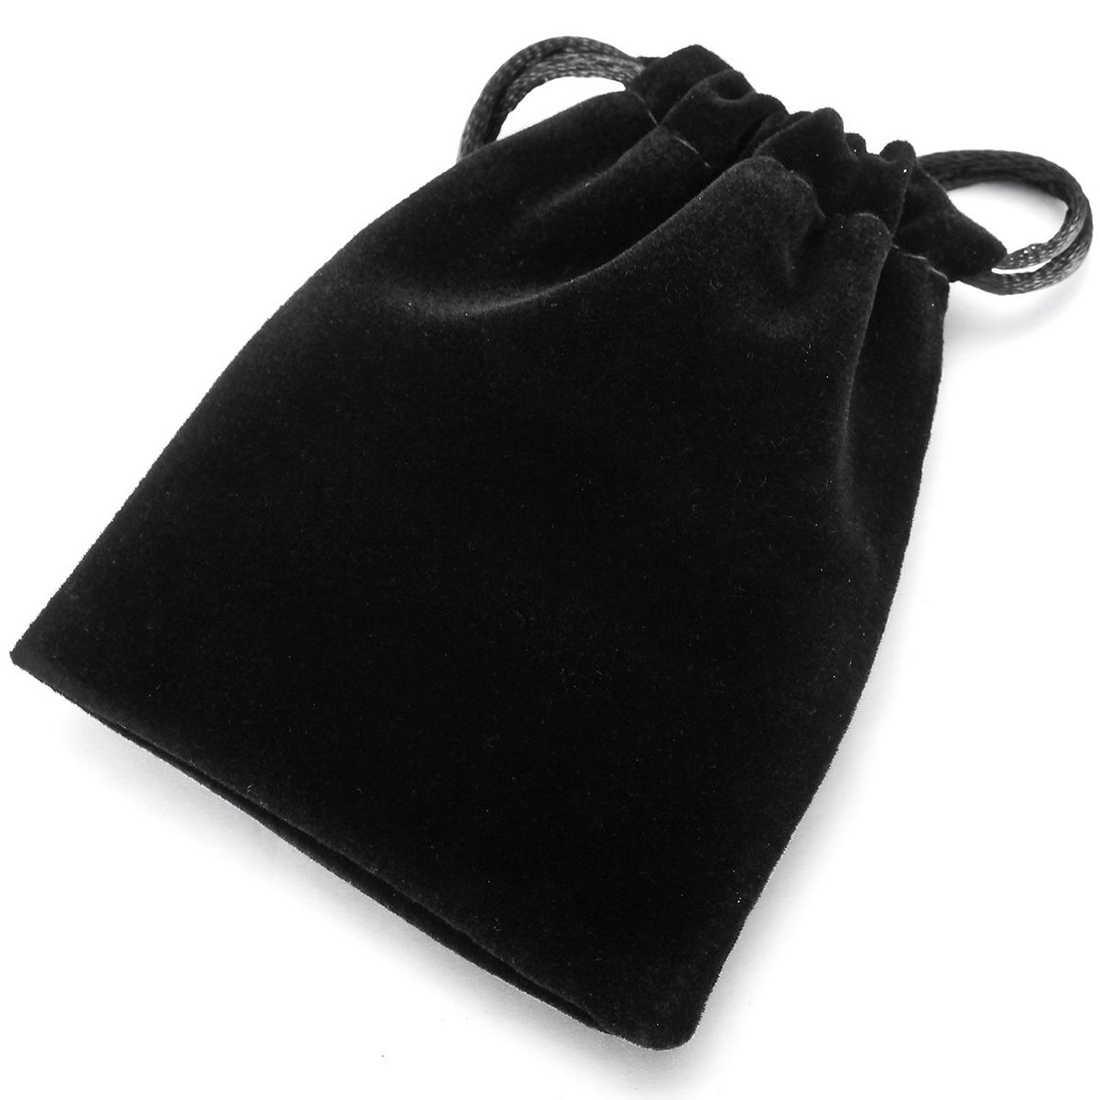 Legering Hanger Ketting Hanger Black Silver Cross Dog Tag plaat Leger Stijl Gepolijst 23 Inch Ketting Ketting Man